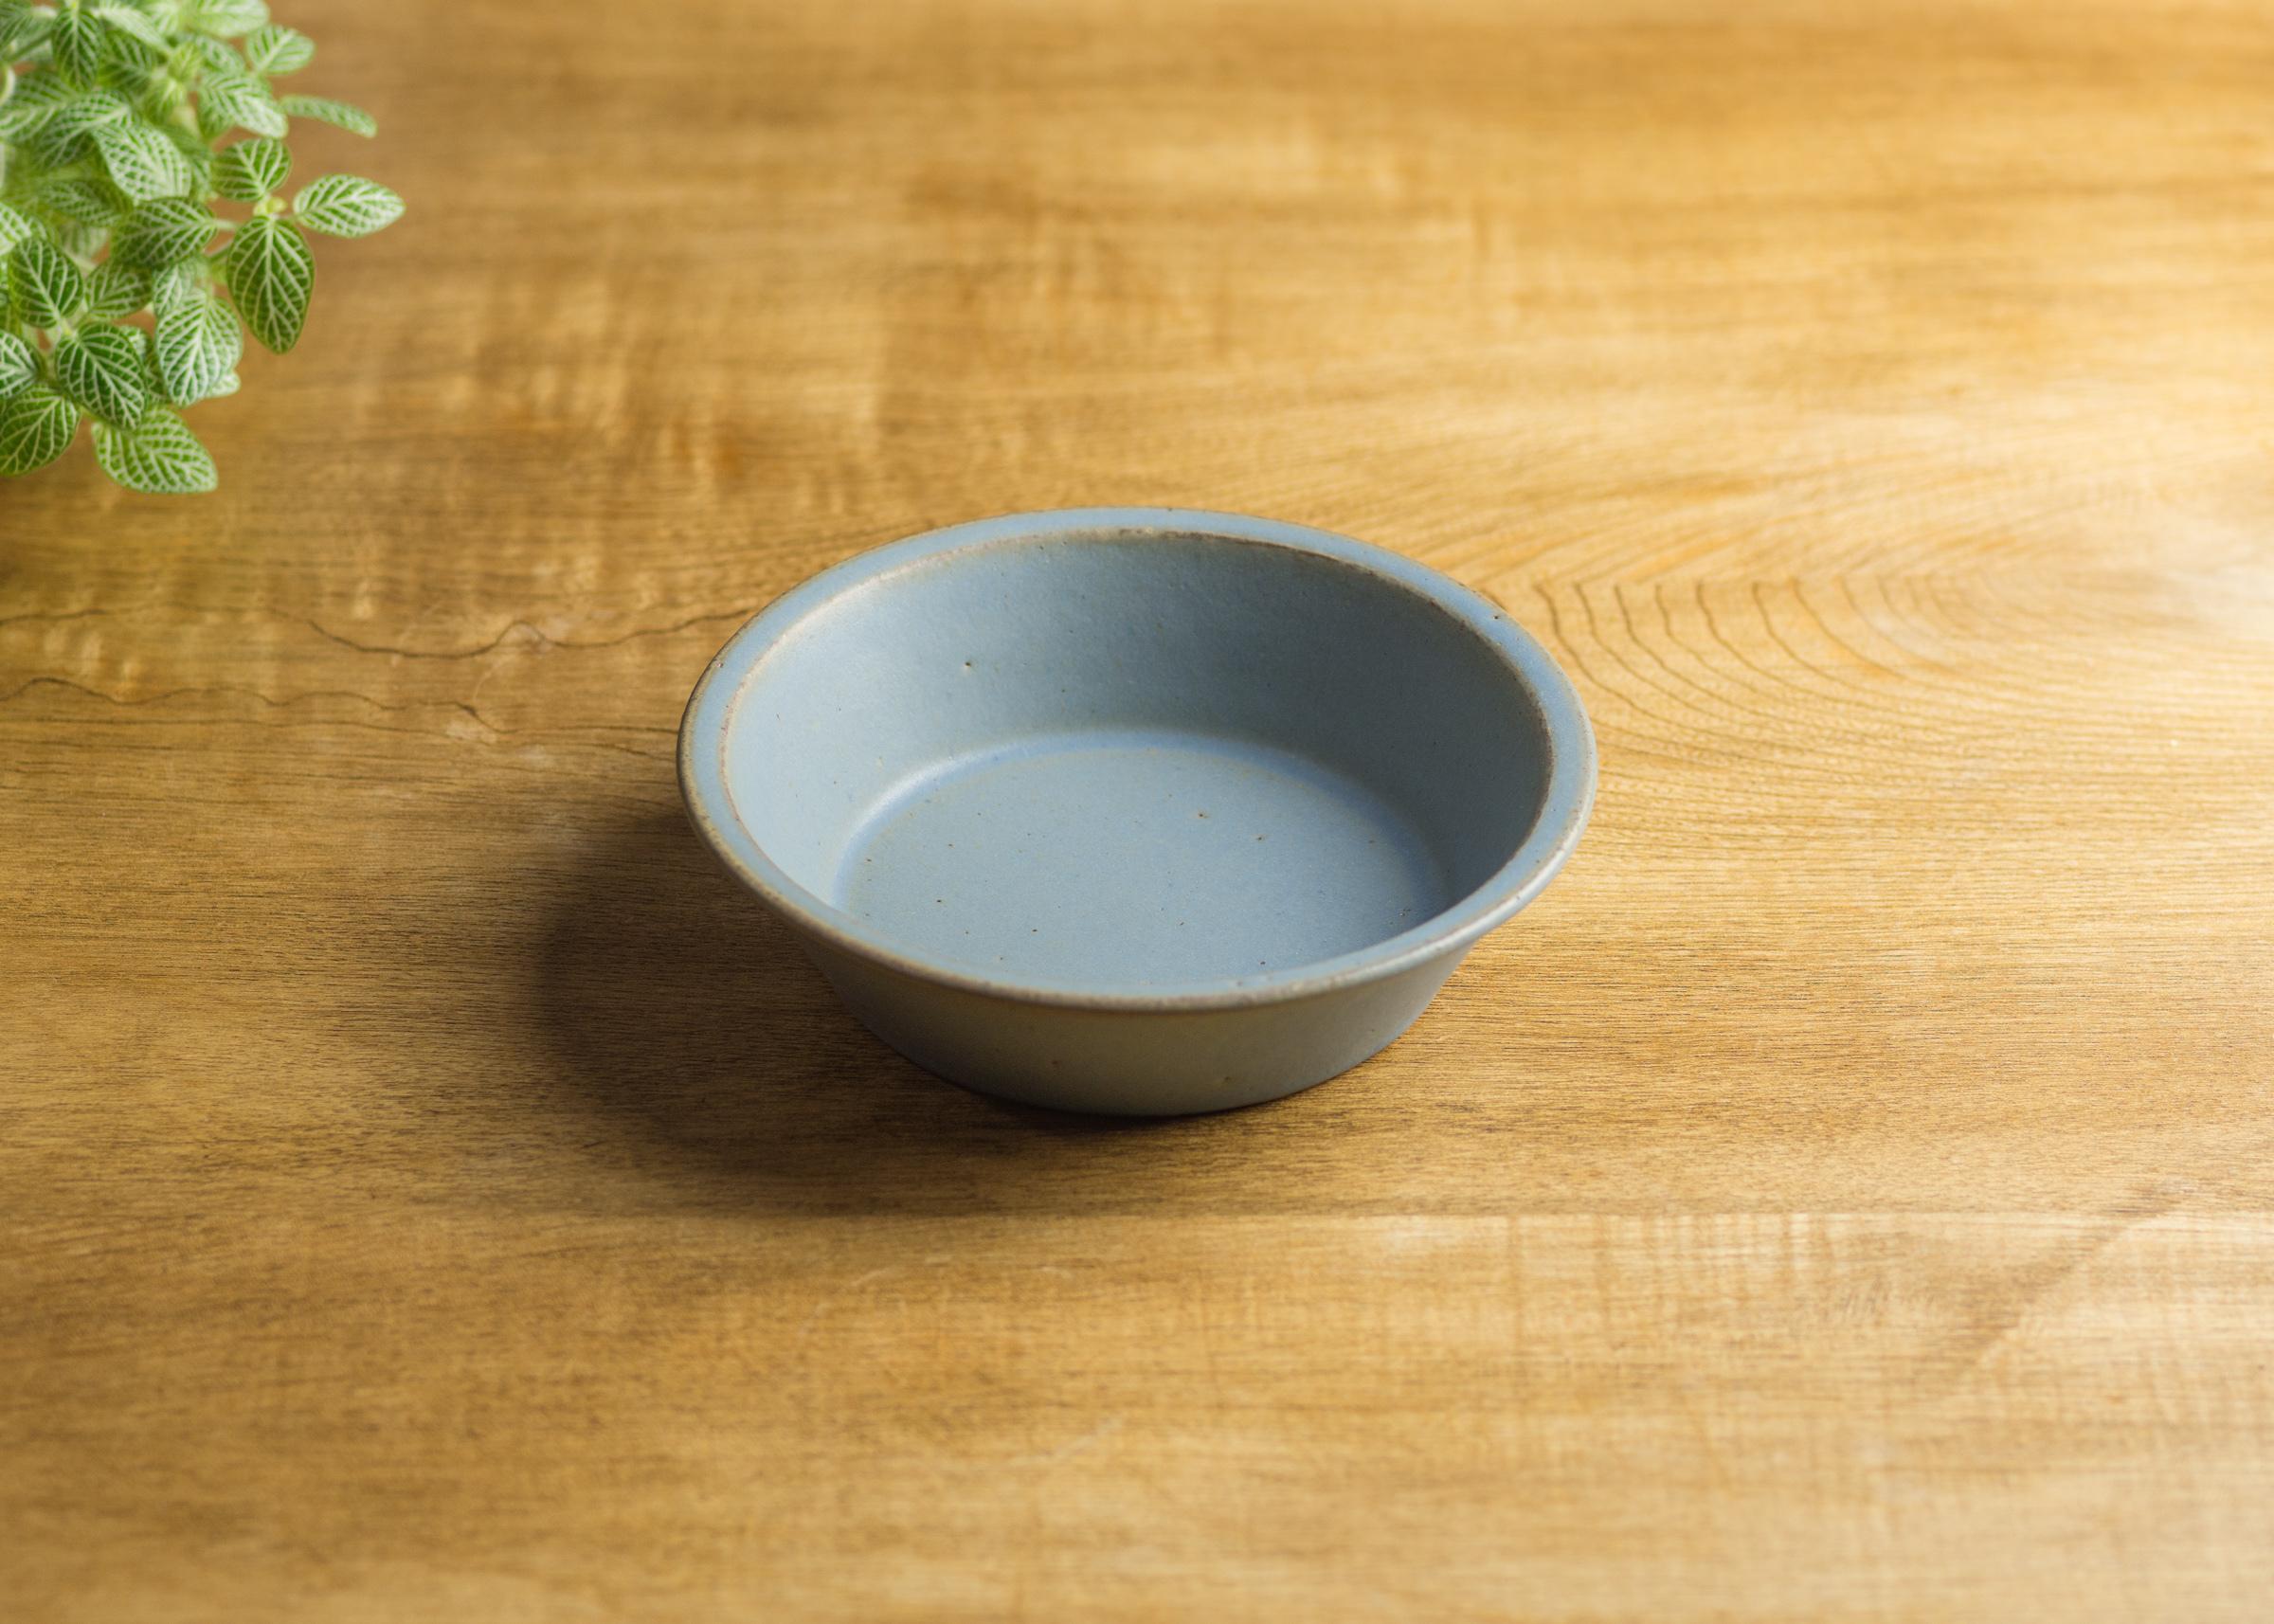 SHIROUMA 浅鉢 15cm 灰色(シリアルボウル・グラタン皿・耐熱皿)/長谷川 哲也